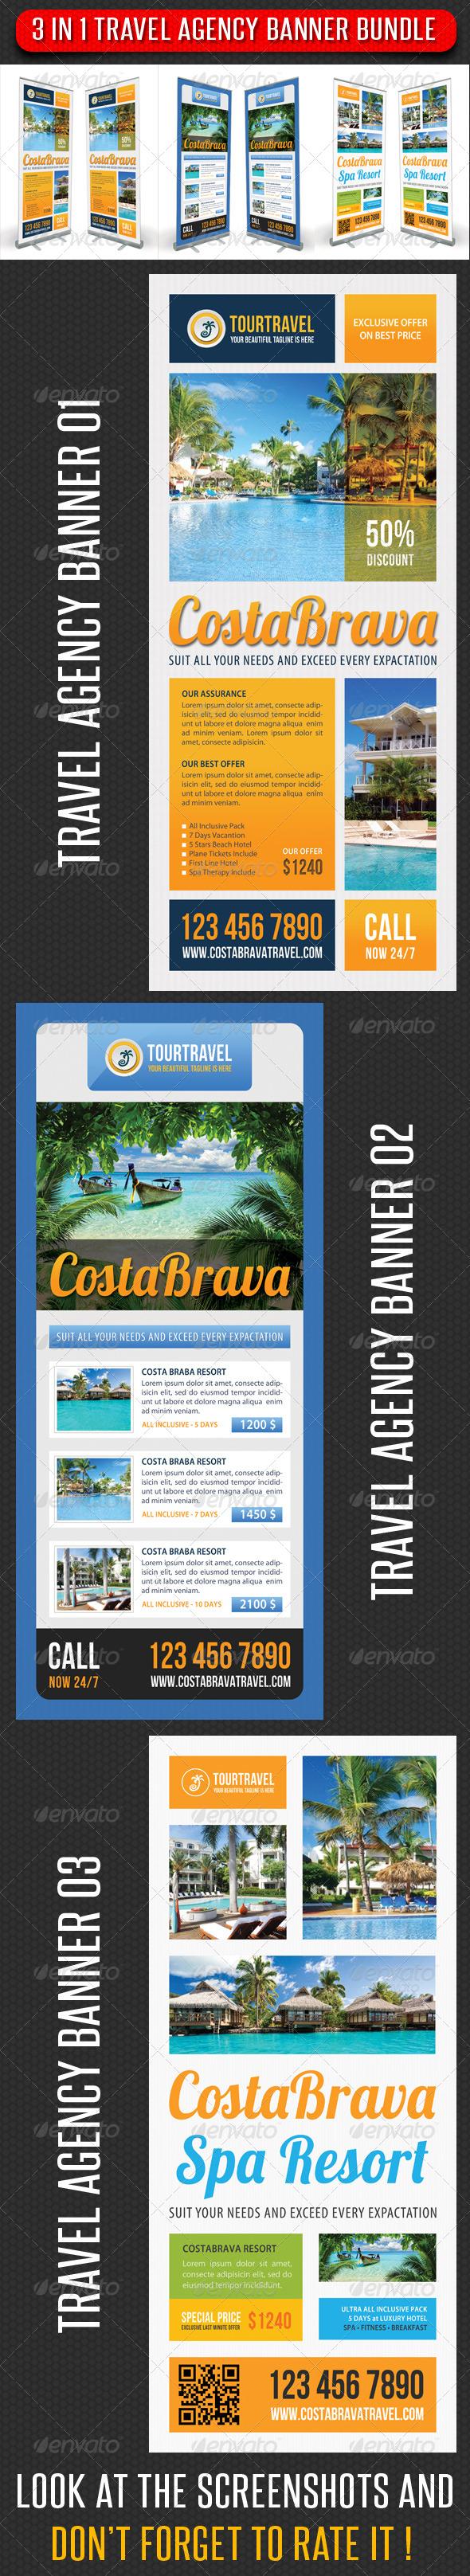 3 in 1 Travel Agency Banner Bundle 02